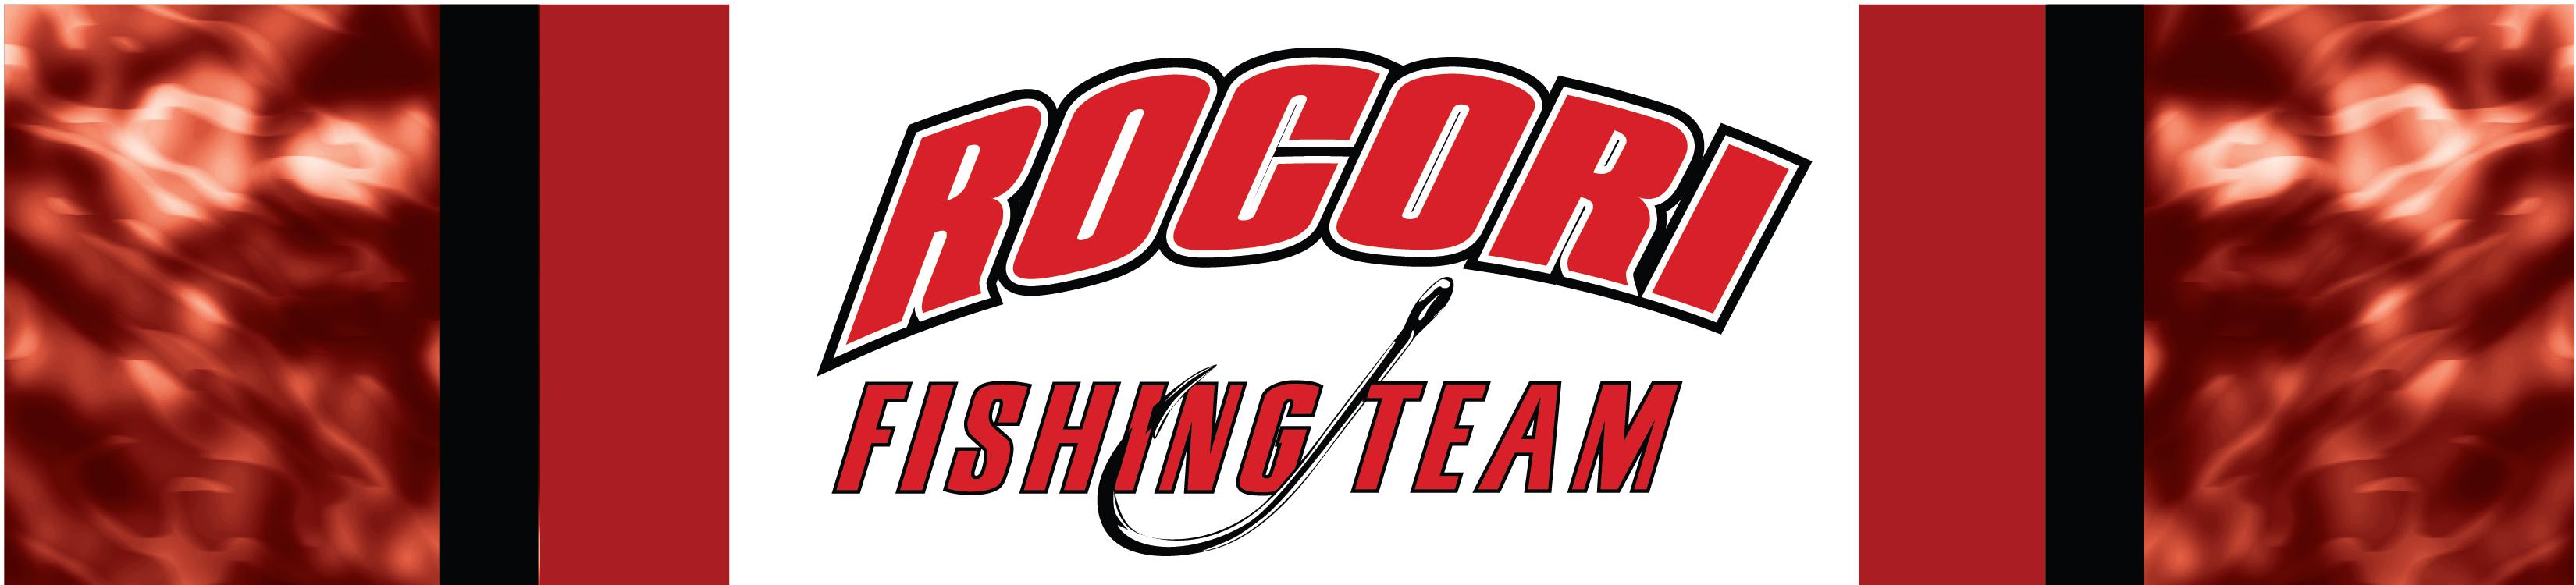 Rocori Fishing Team